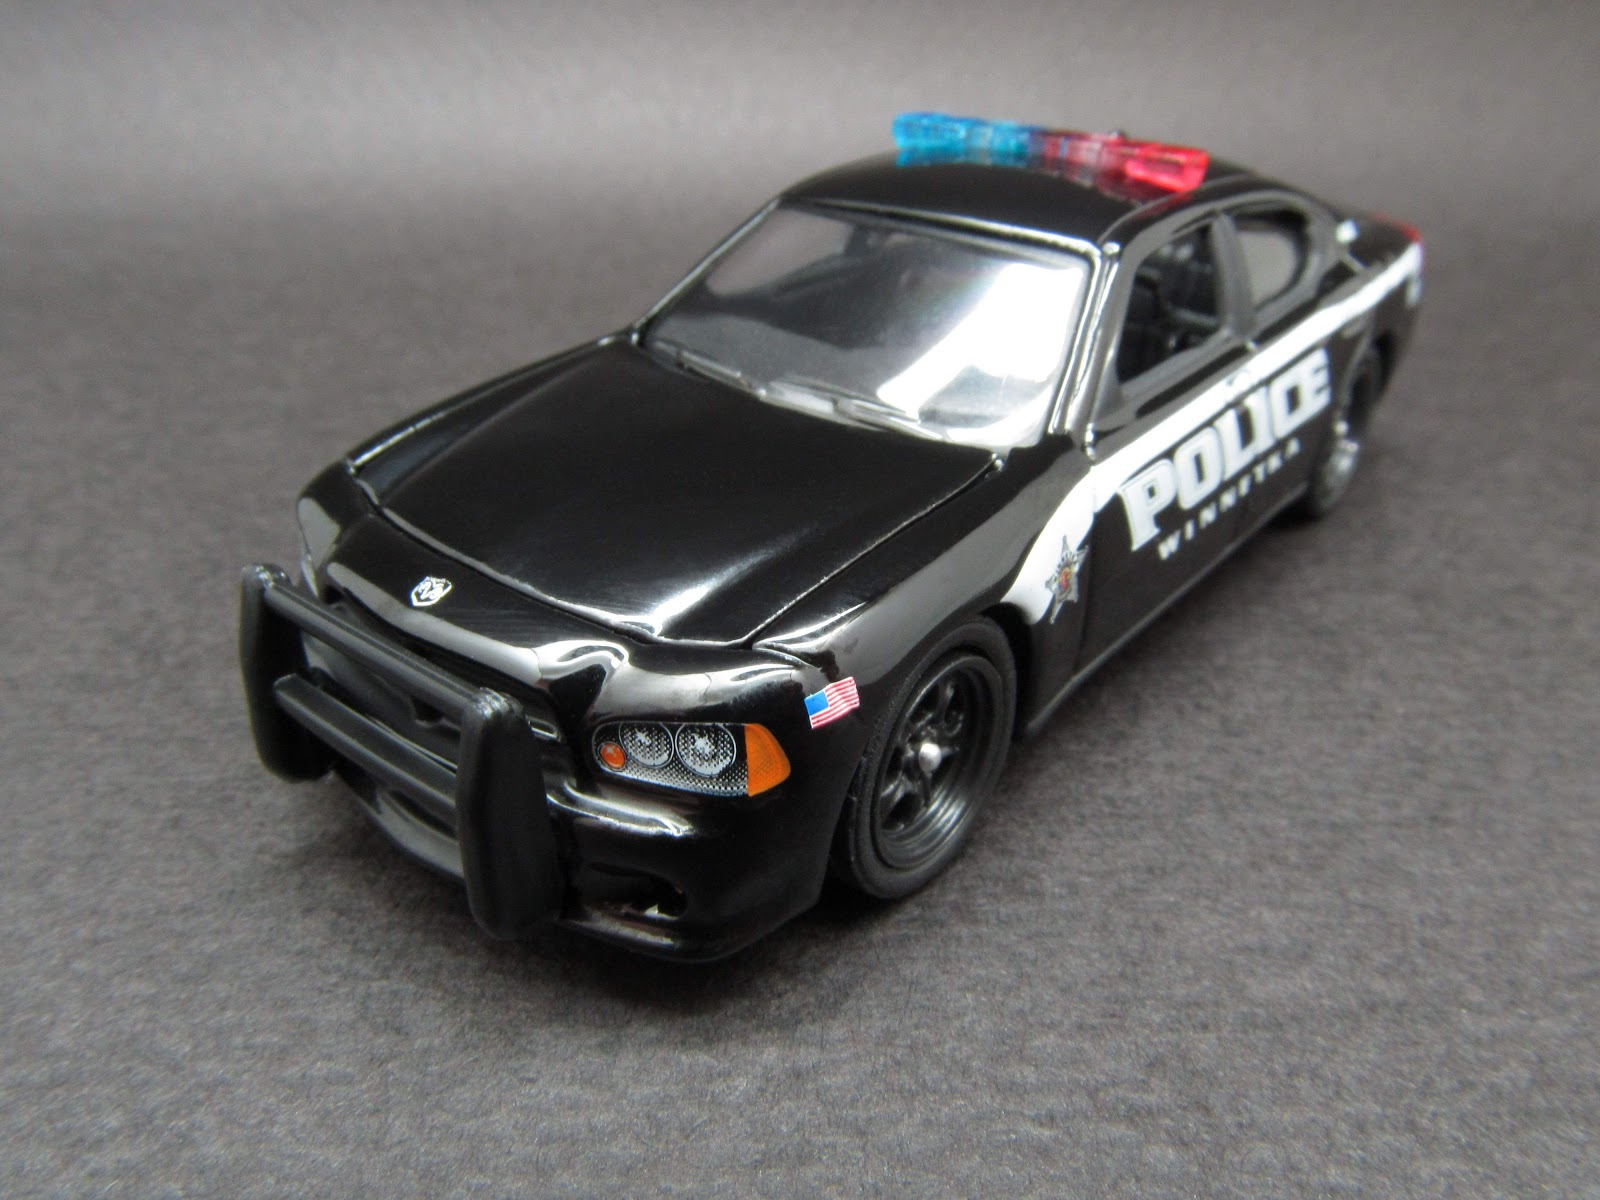 Diecast Hobbist 2010 Dodge Charger Winnetka IL Police